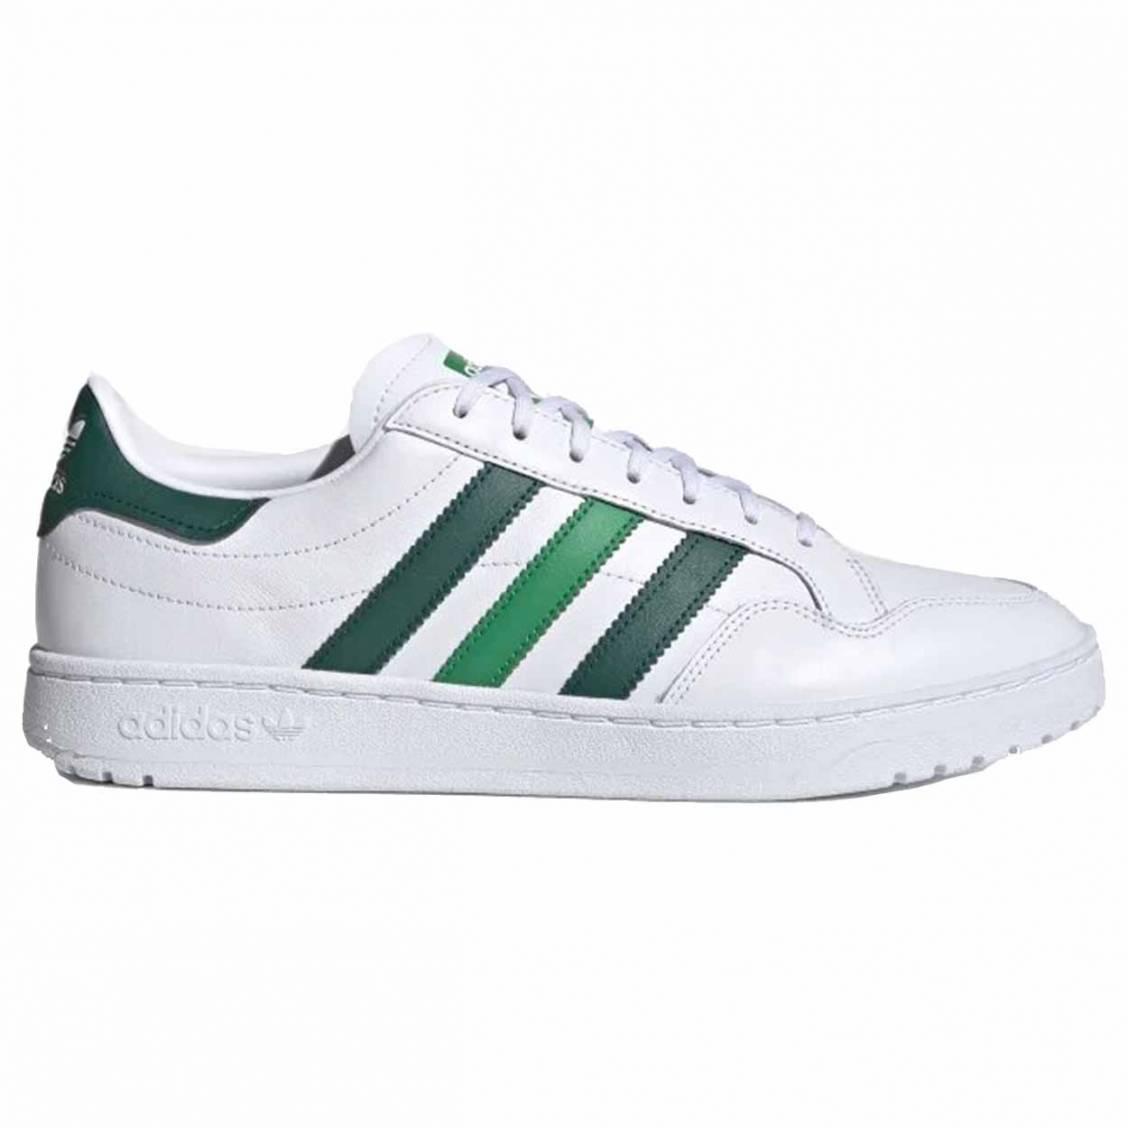 Baskets Adidas Original en cuir blanc à bandes vertes   Rue Des Hommes